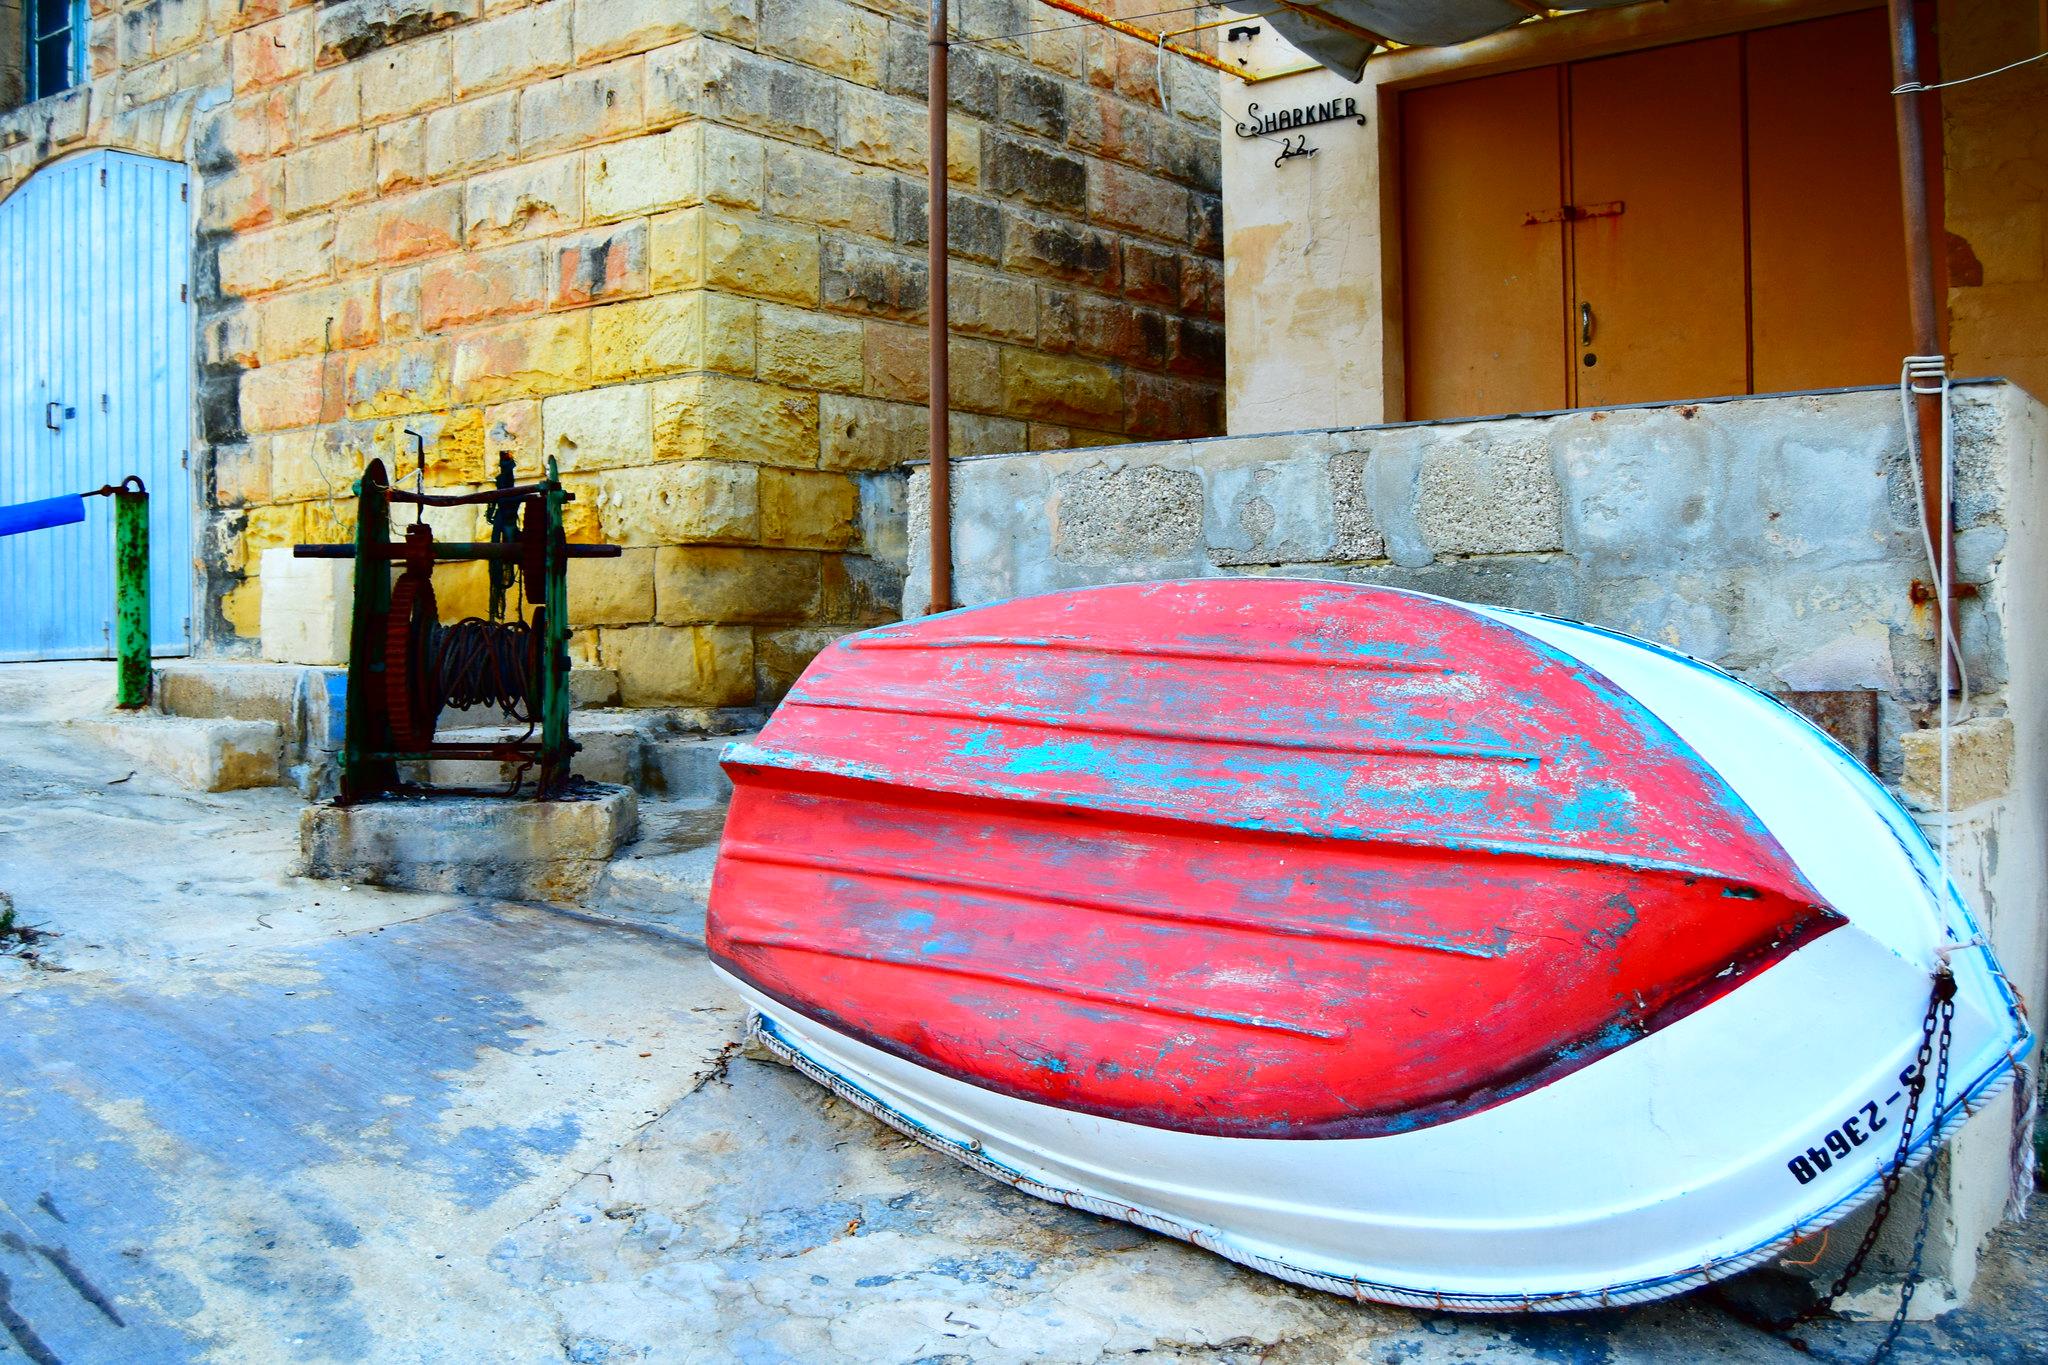 Underside of boat showing antifouling paint coat